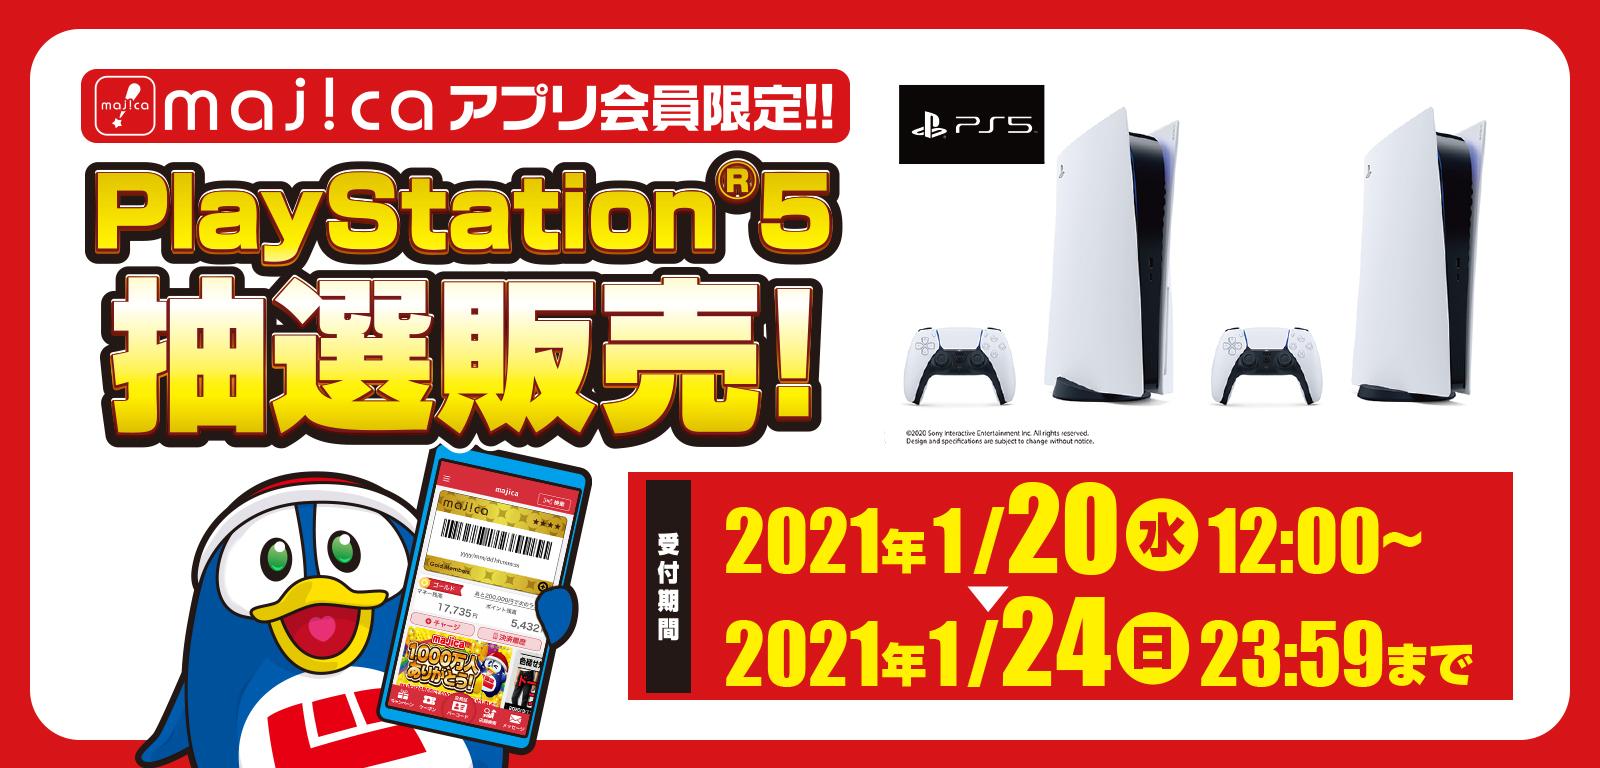 majicaアプリ会員限定!!PlayStation®5抽選販売! 受付期間2021年1/20 12:00~1/24 23:59まで